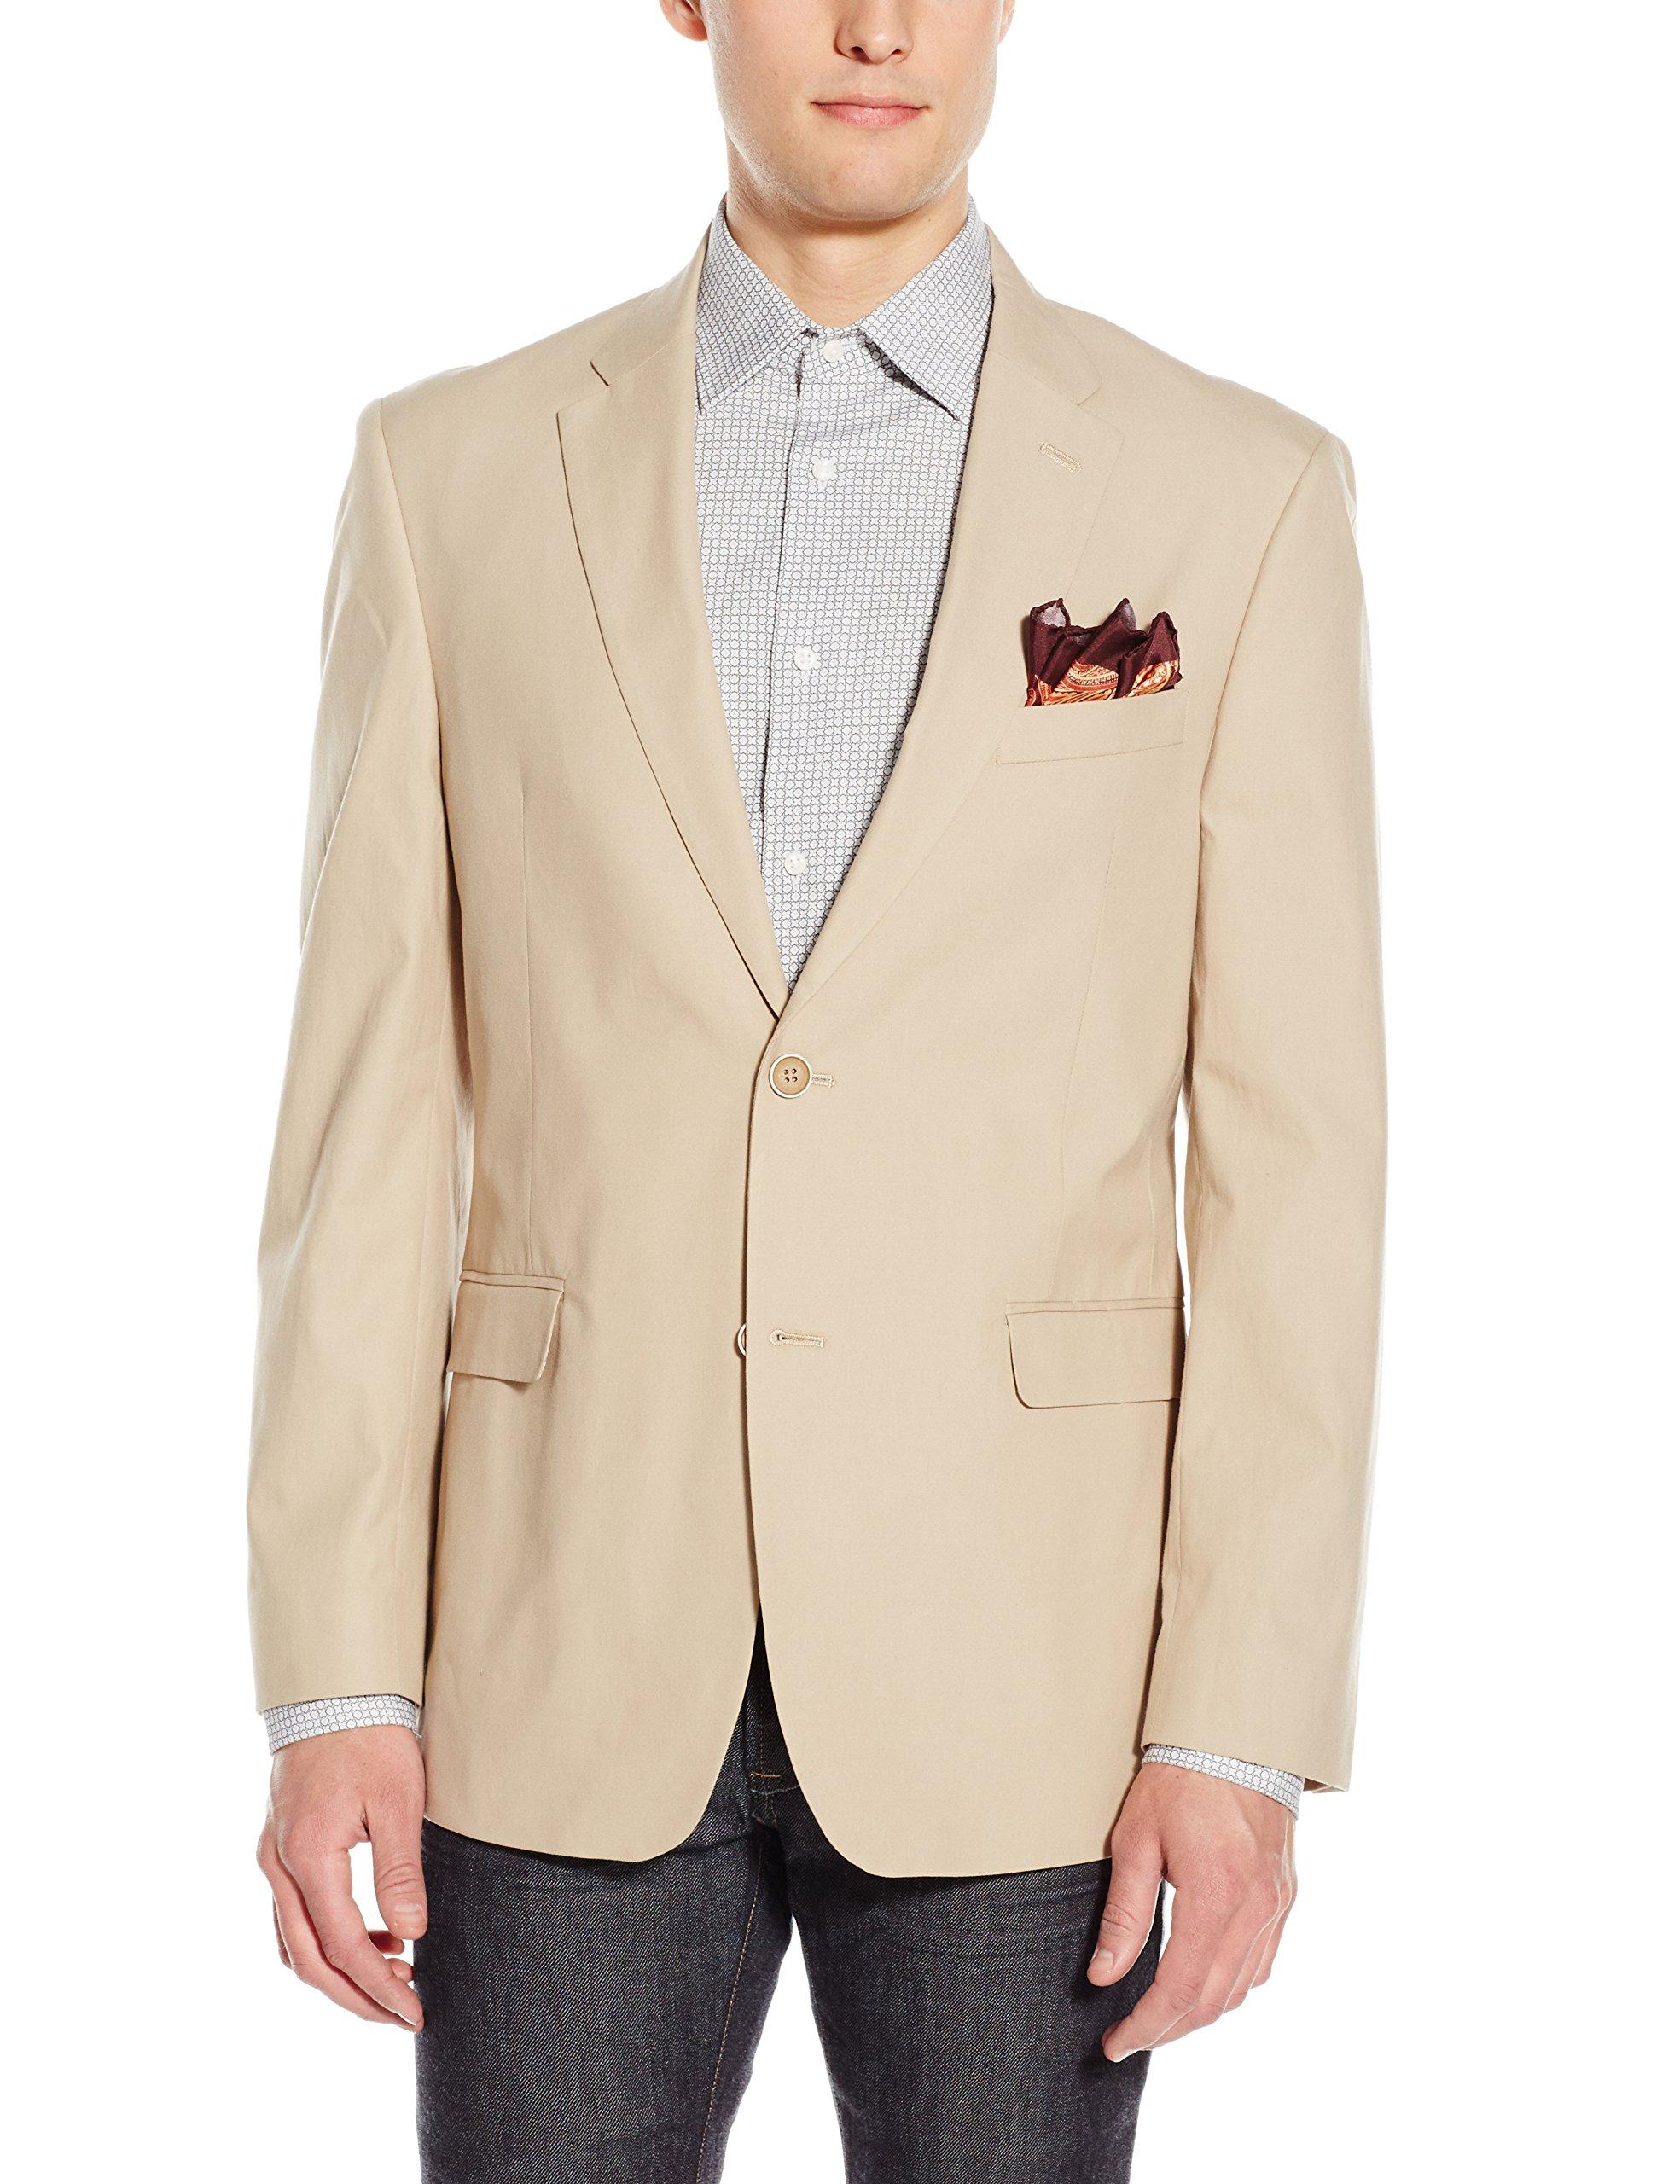 Tommy Hilfiger Men's Two Button Stretch Suit Separate Jacket, Khaki, 42 Long